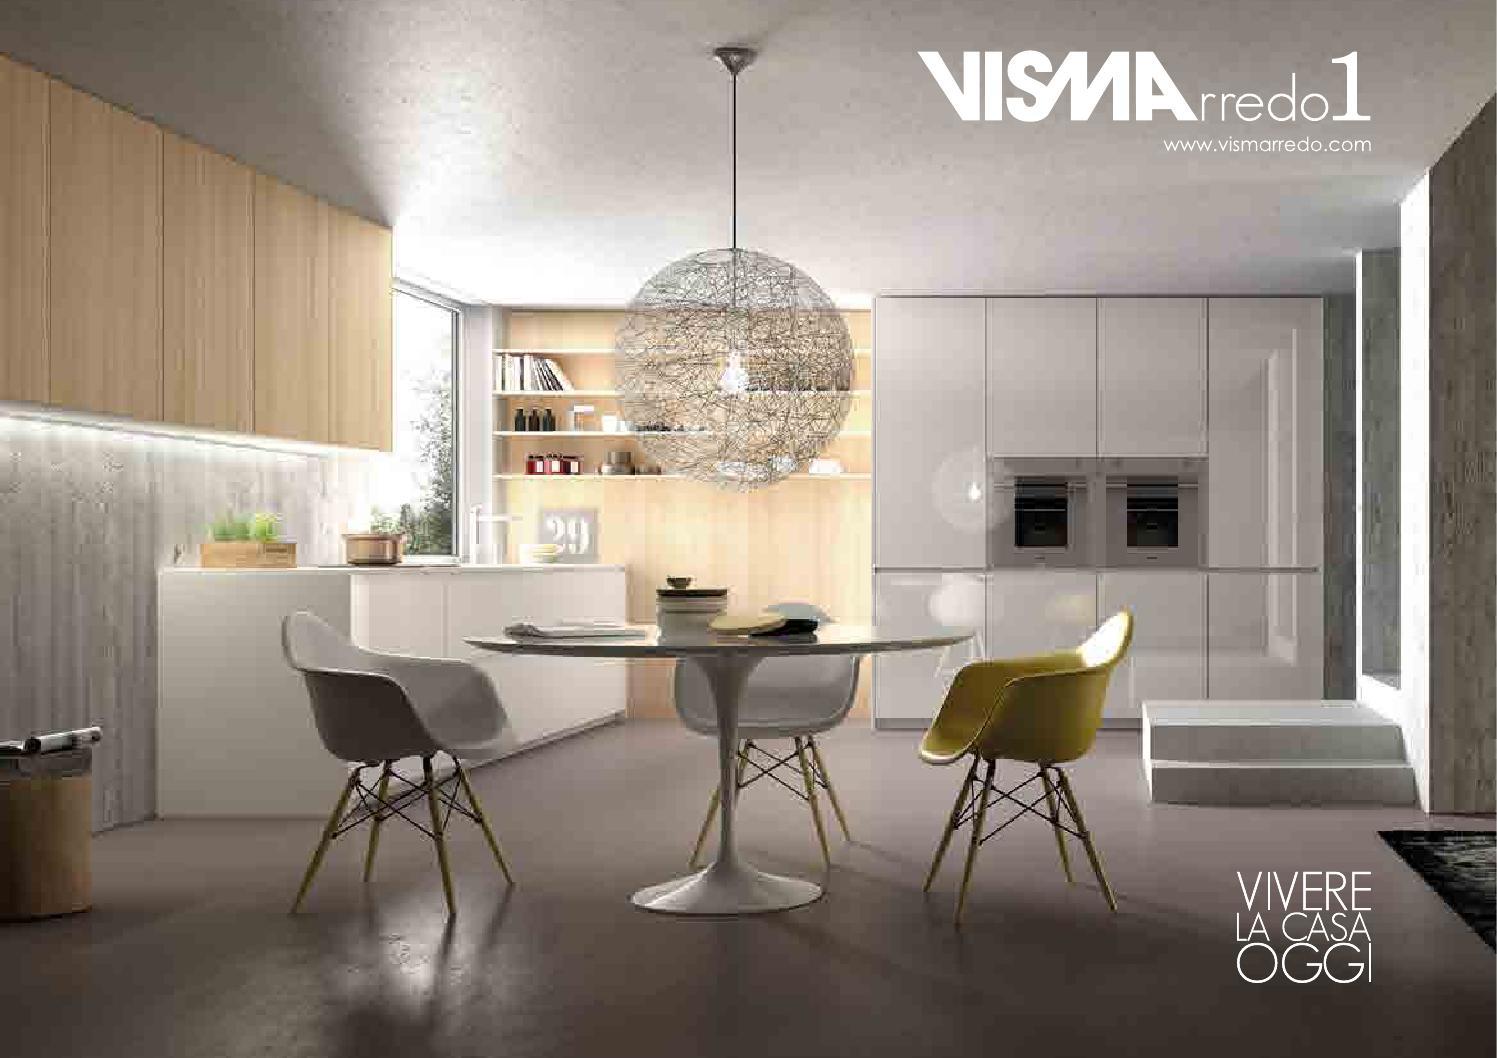 Catalogo visma arredo 2016 by visma arredo 1 srl issuu for Visma arredo 1